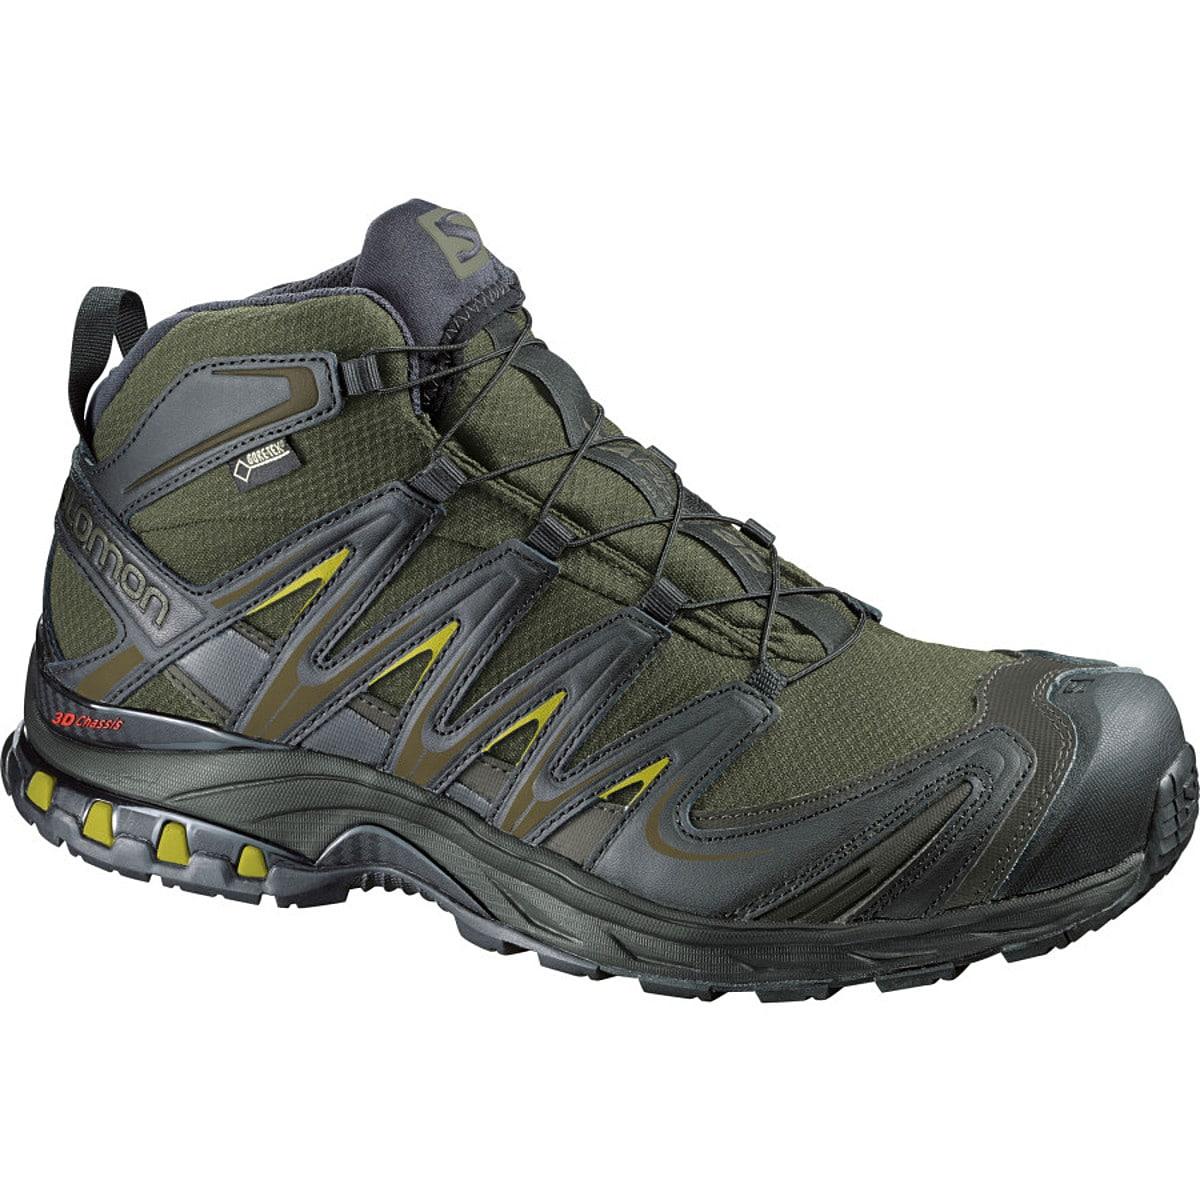 Salomon XA Pro Mid GTX Hiking Shoe - Men's | eBay